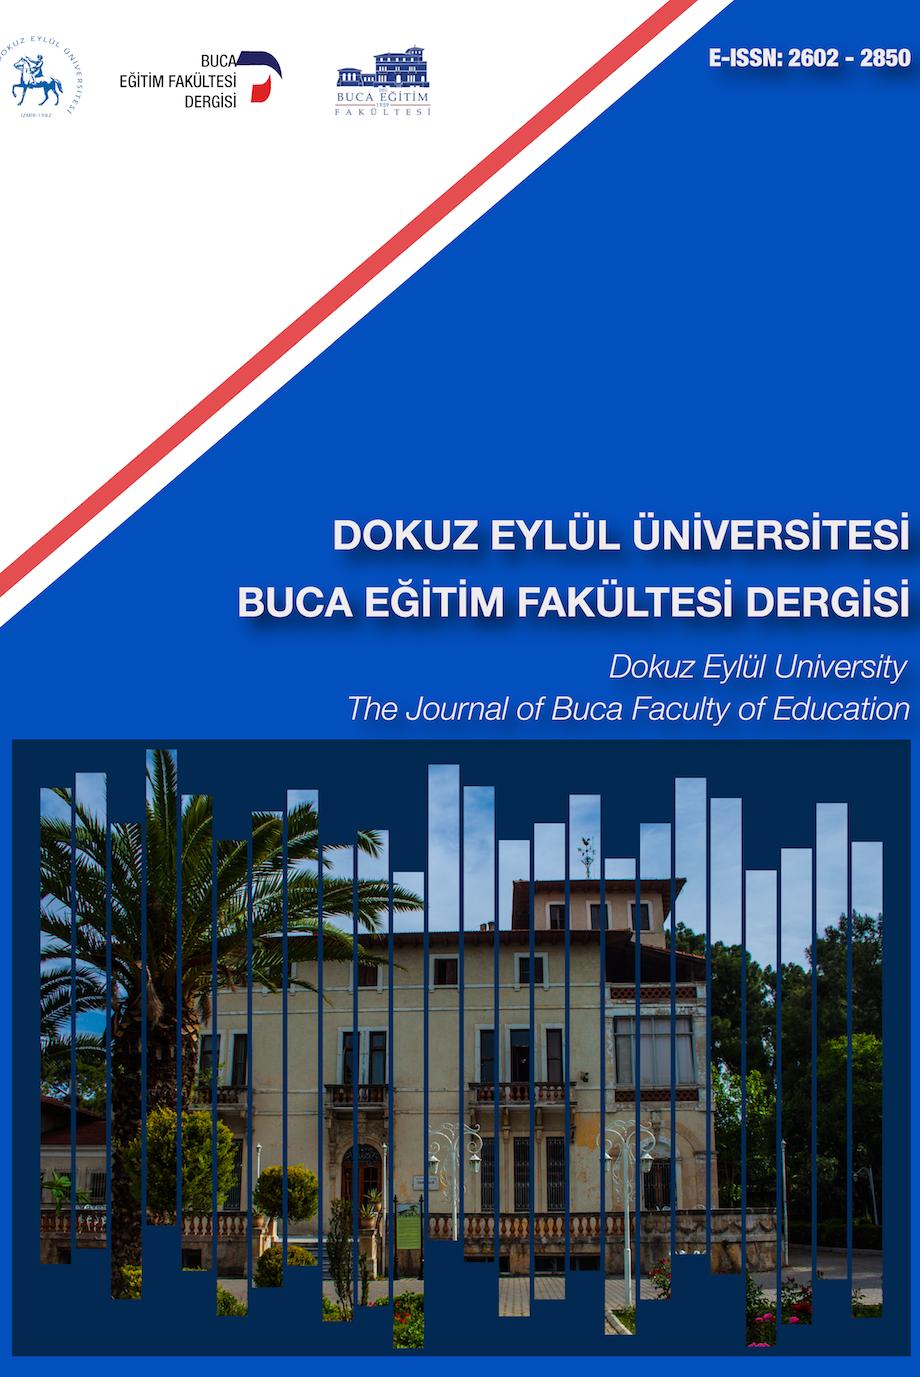 Buca Faculty of Education Journal